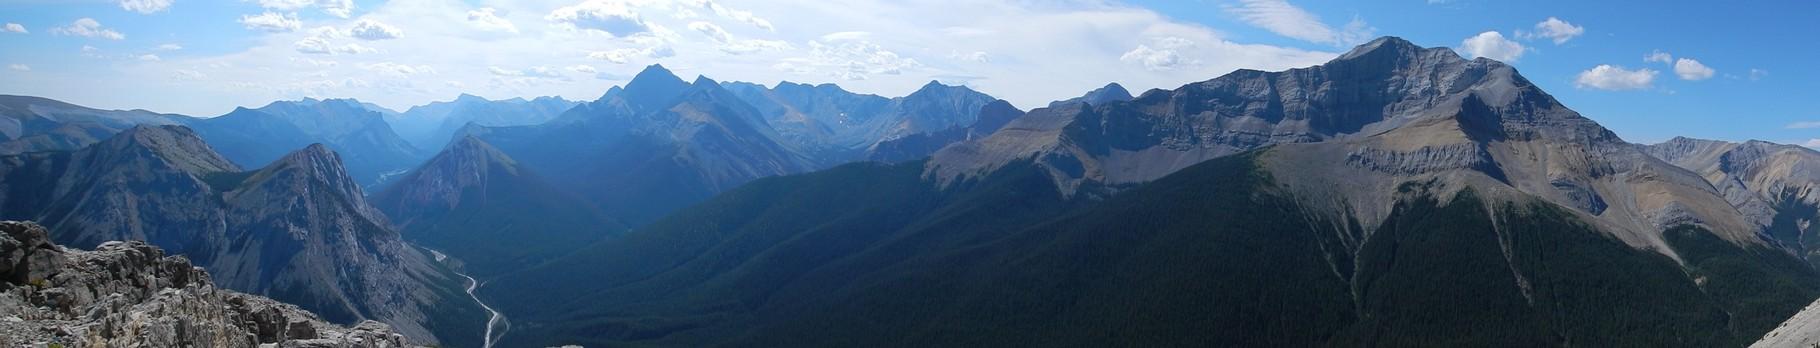 Top of Sulphur Mountain Jasper NP